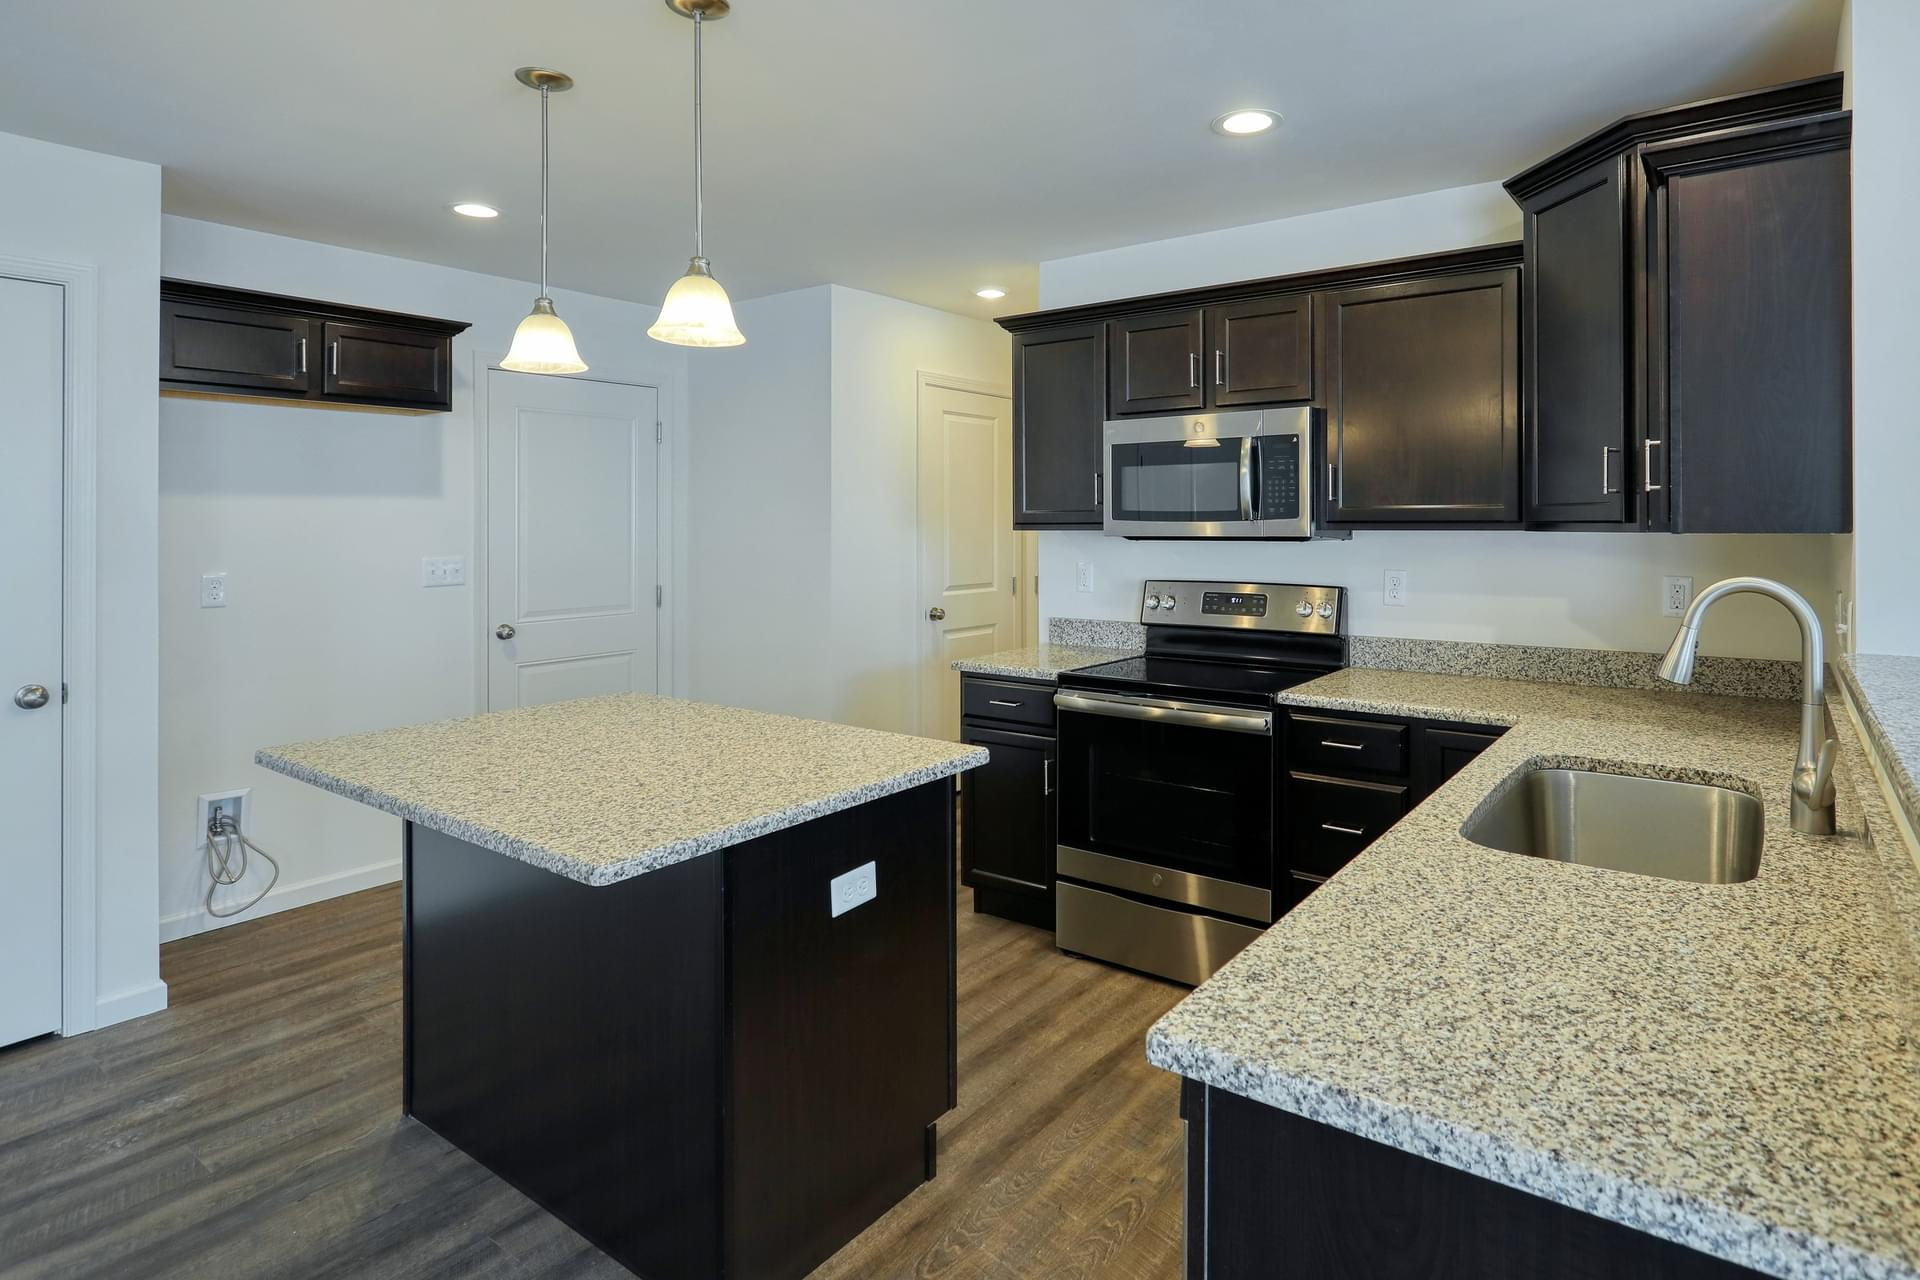 New Home in Mechanicsburg, PA